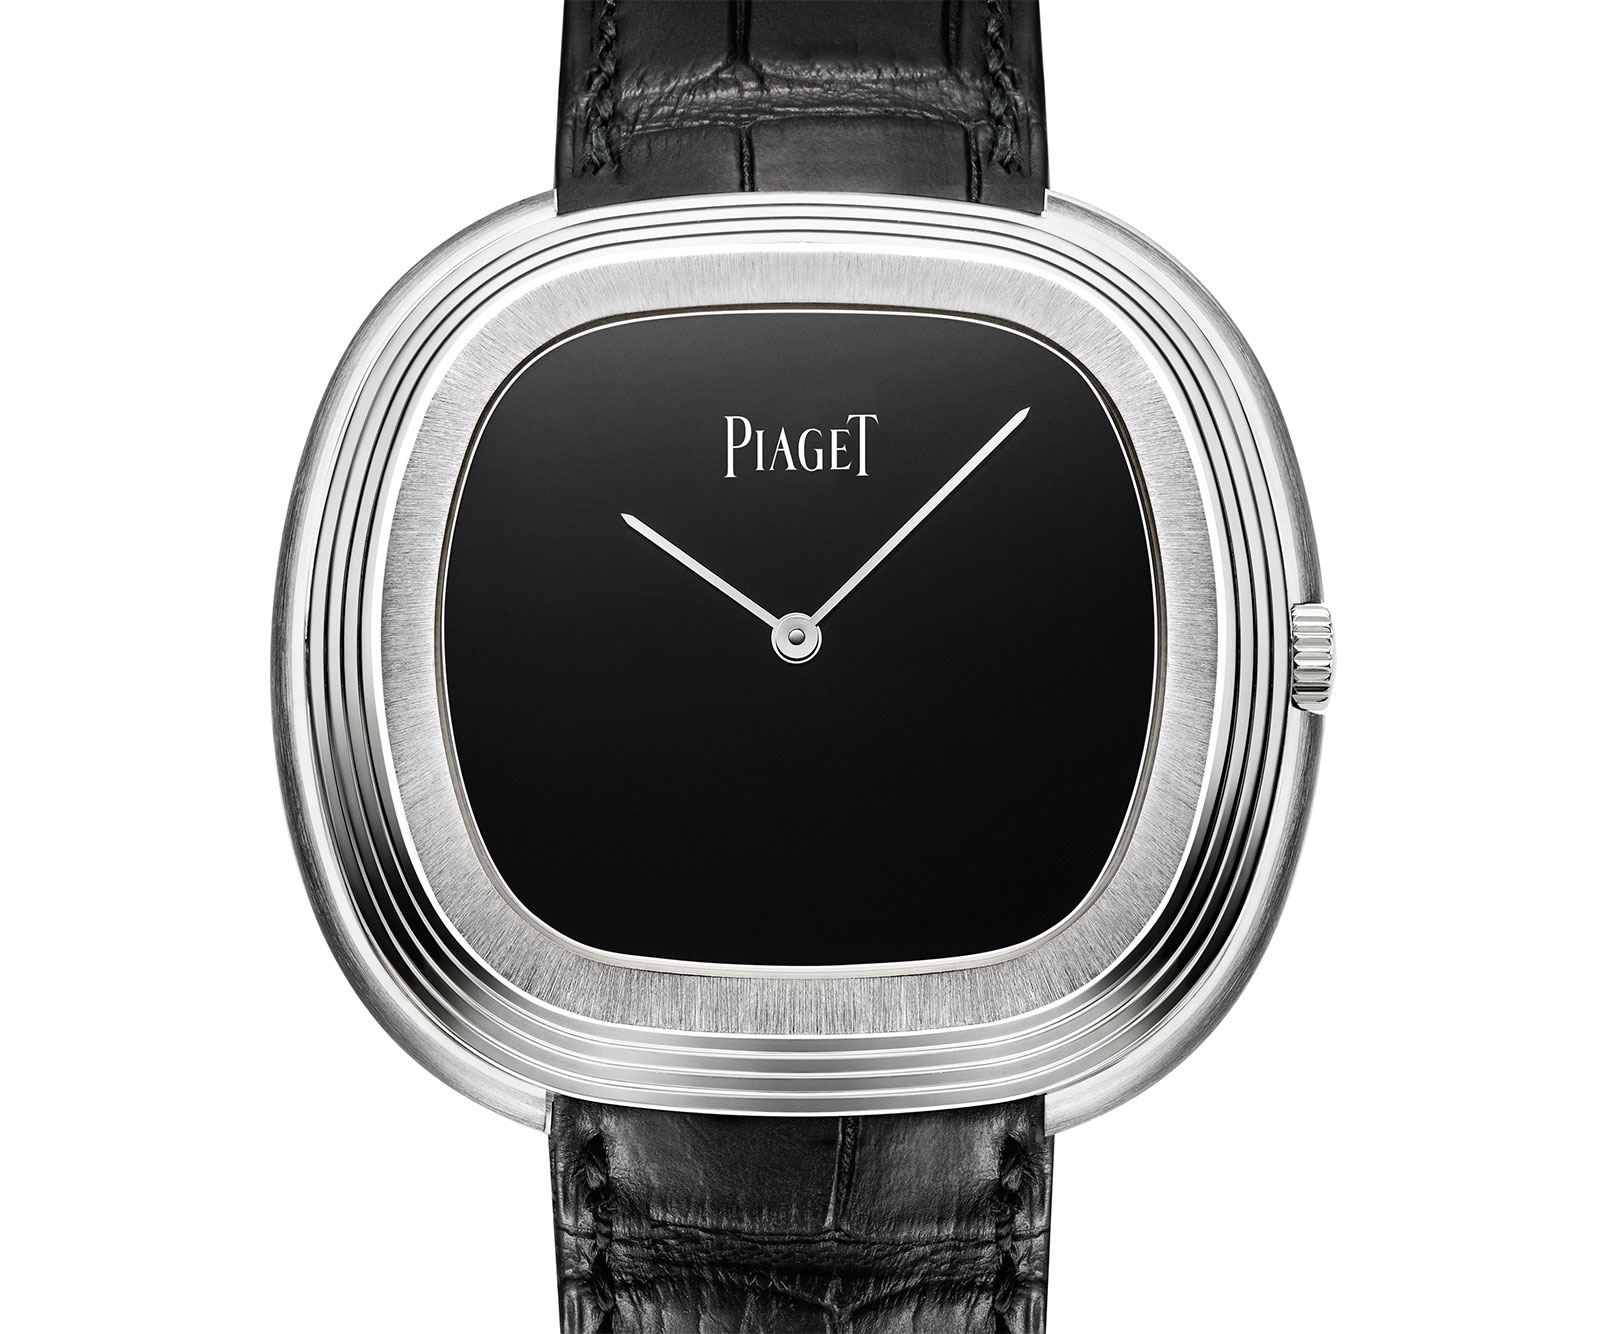 Piaget-Black-Tie-vintage-inspiration-1